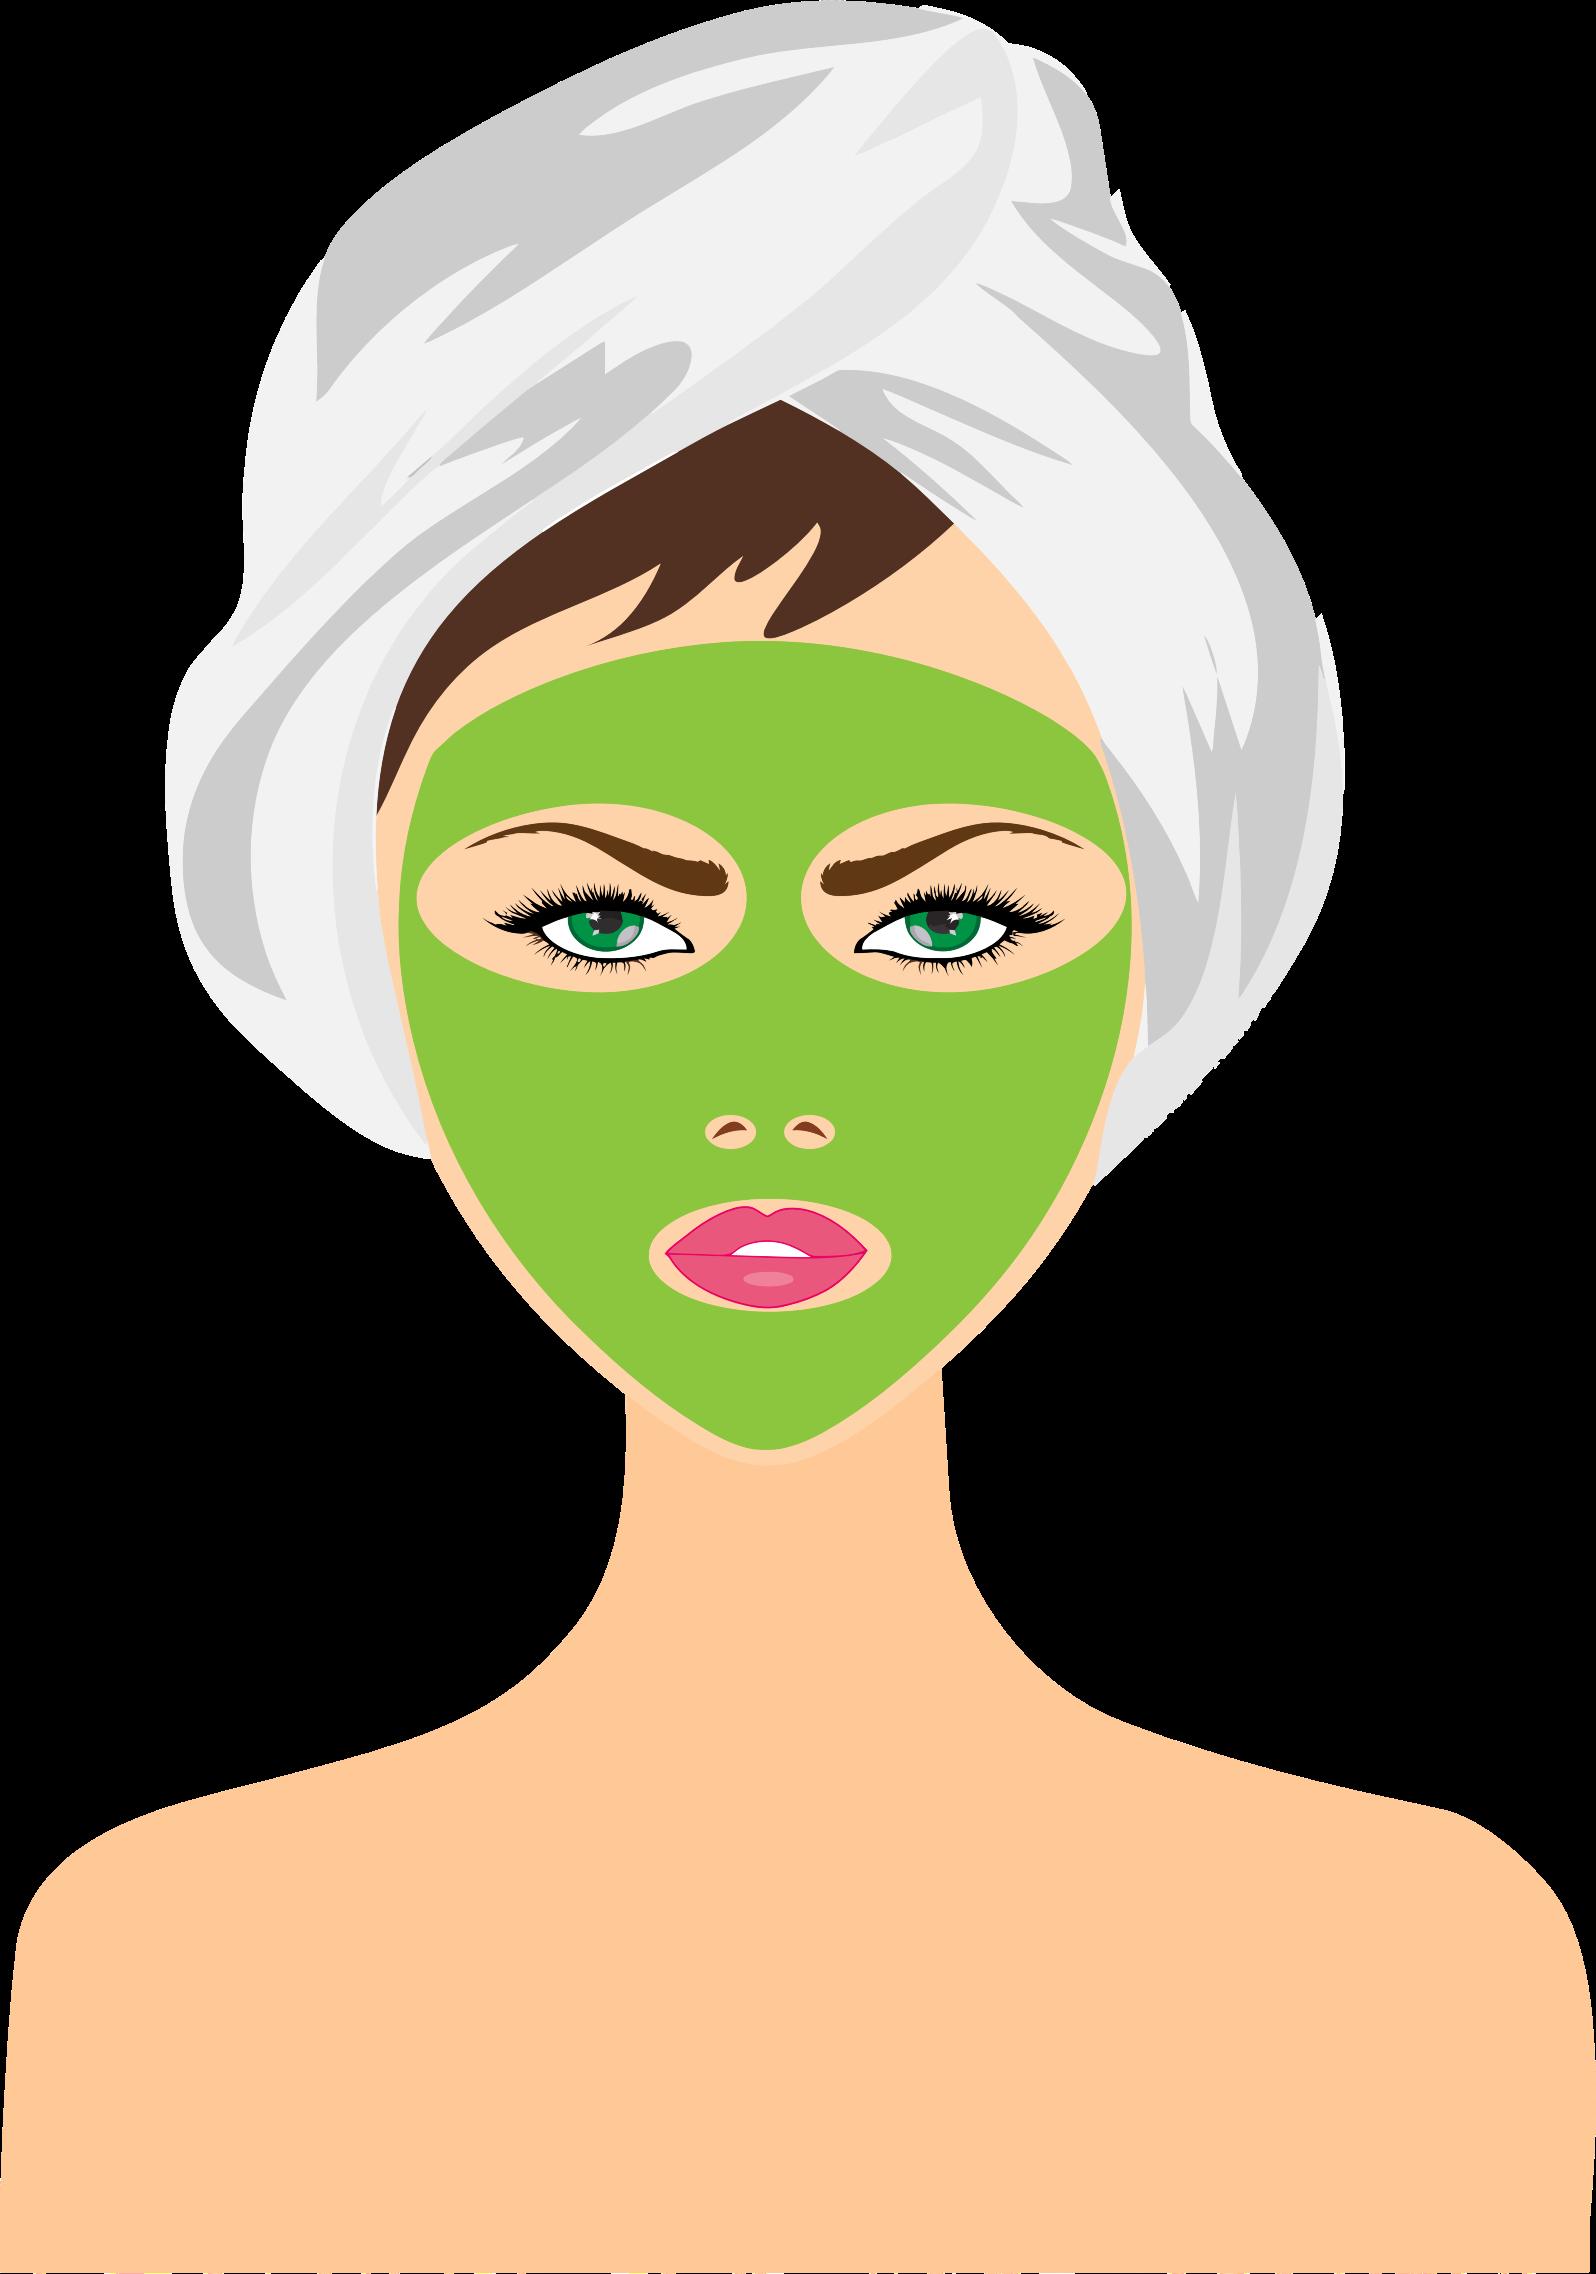 Skin clipart hygiene. Image result for beauty